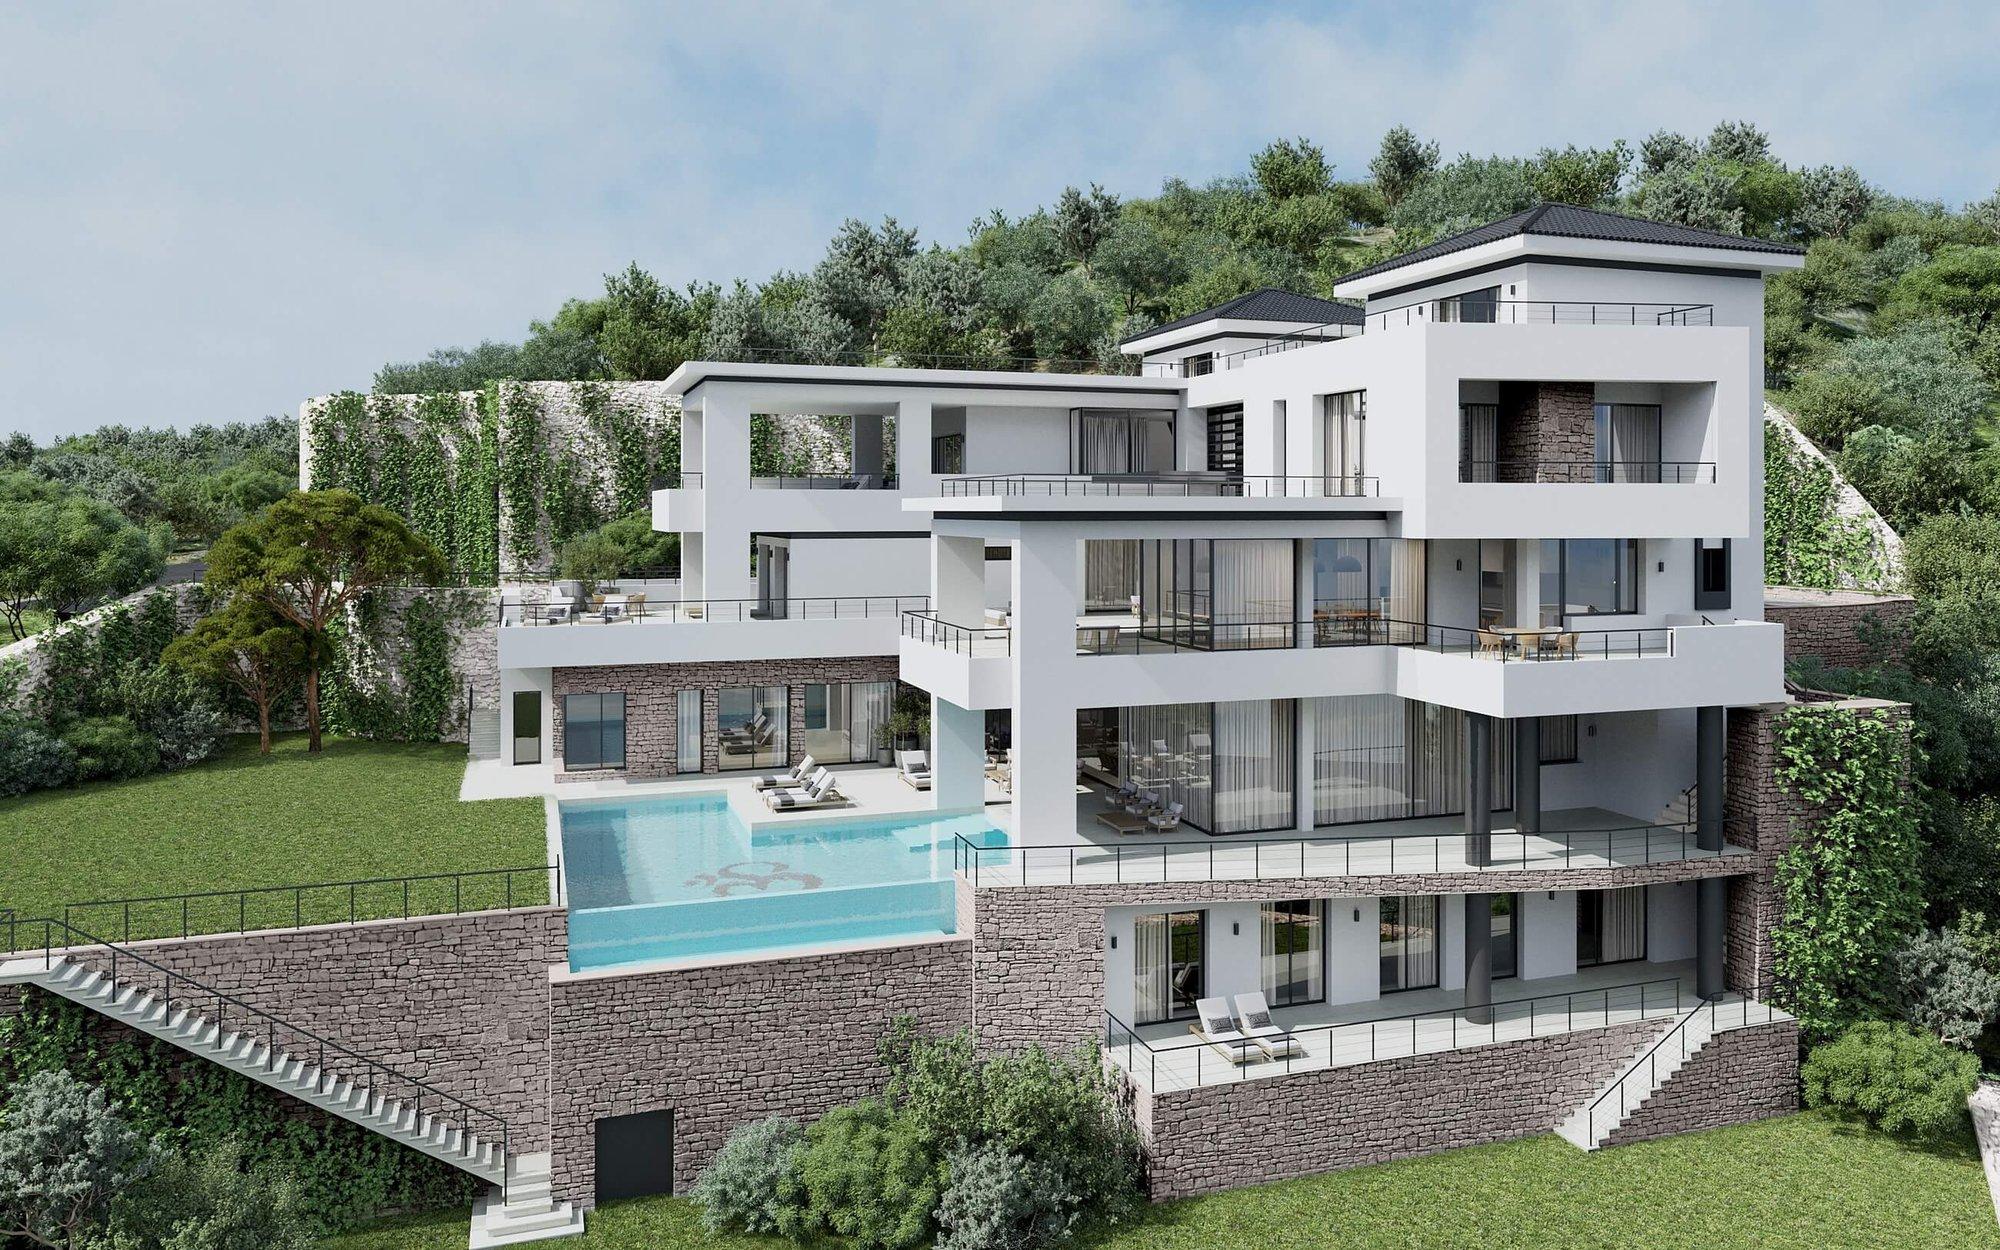 Modern & Luxurious Avant-garde Villa Located in the Alcuzcuz Nature Reserve (Benahavís), 15 minutes from Puerto Banús